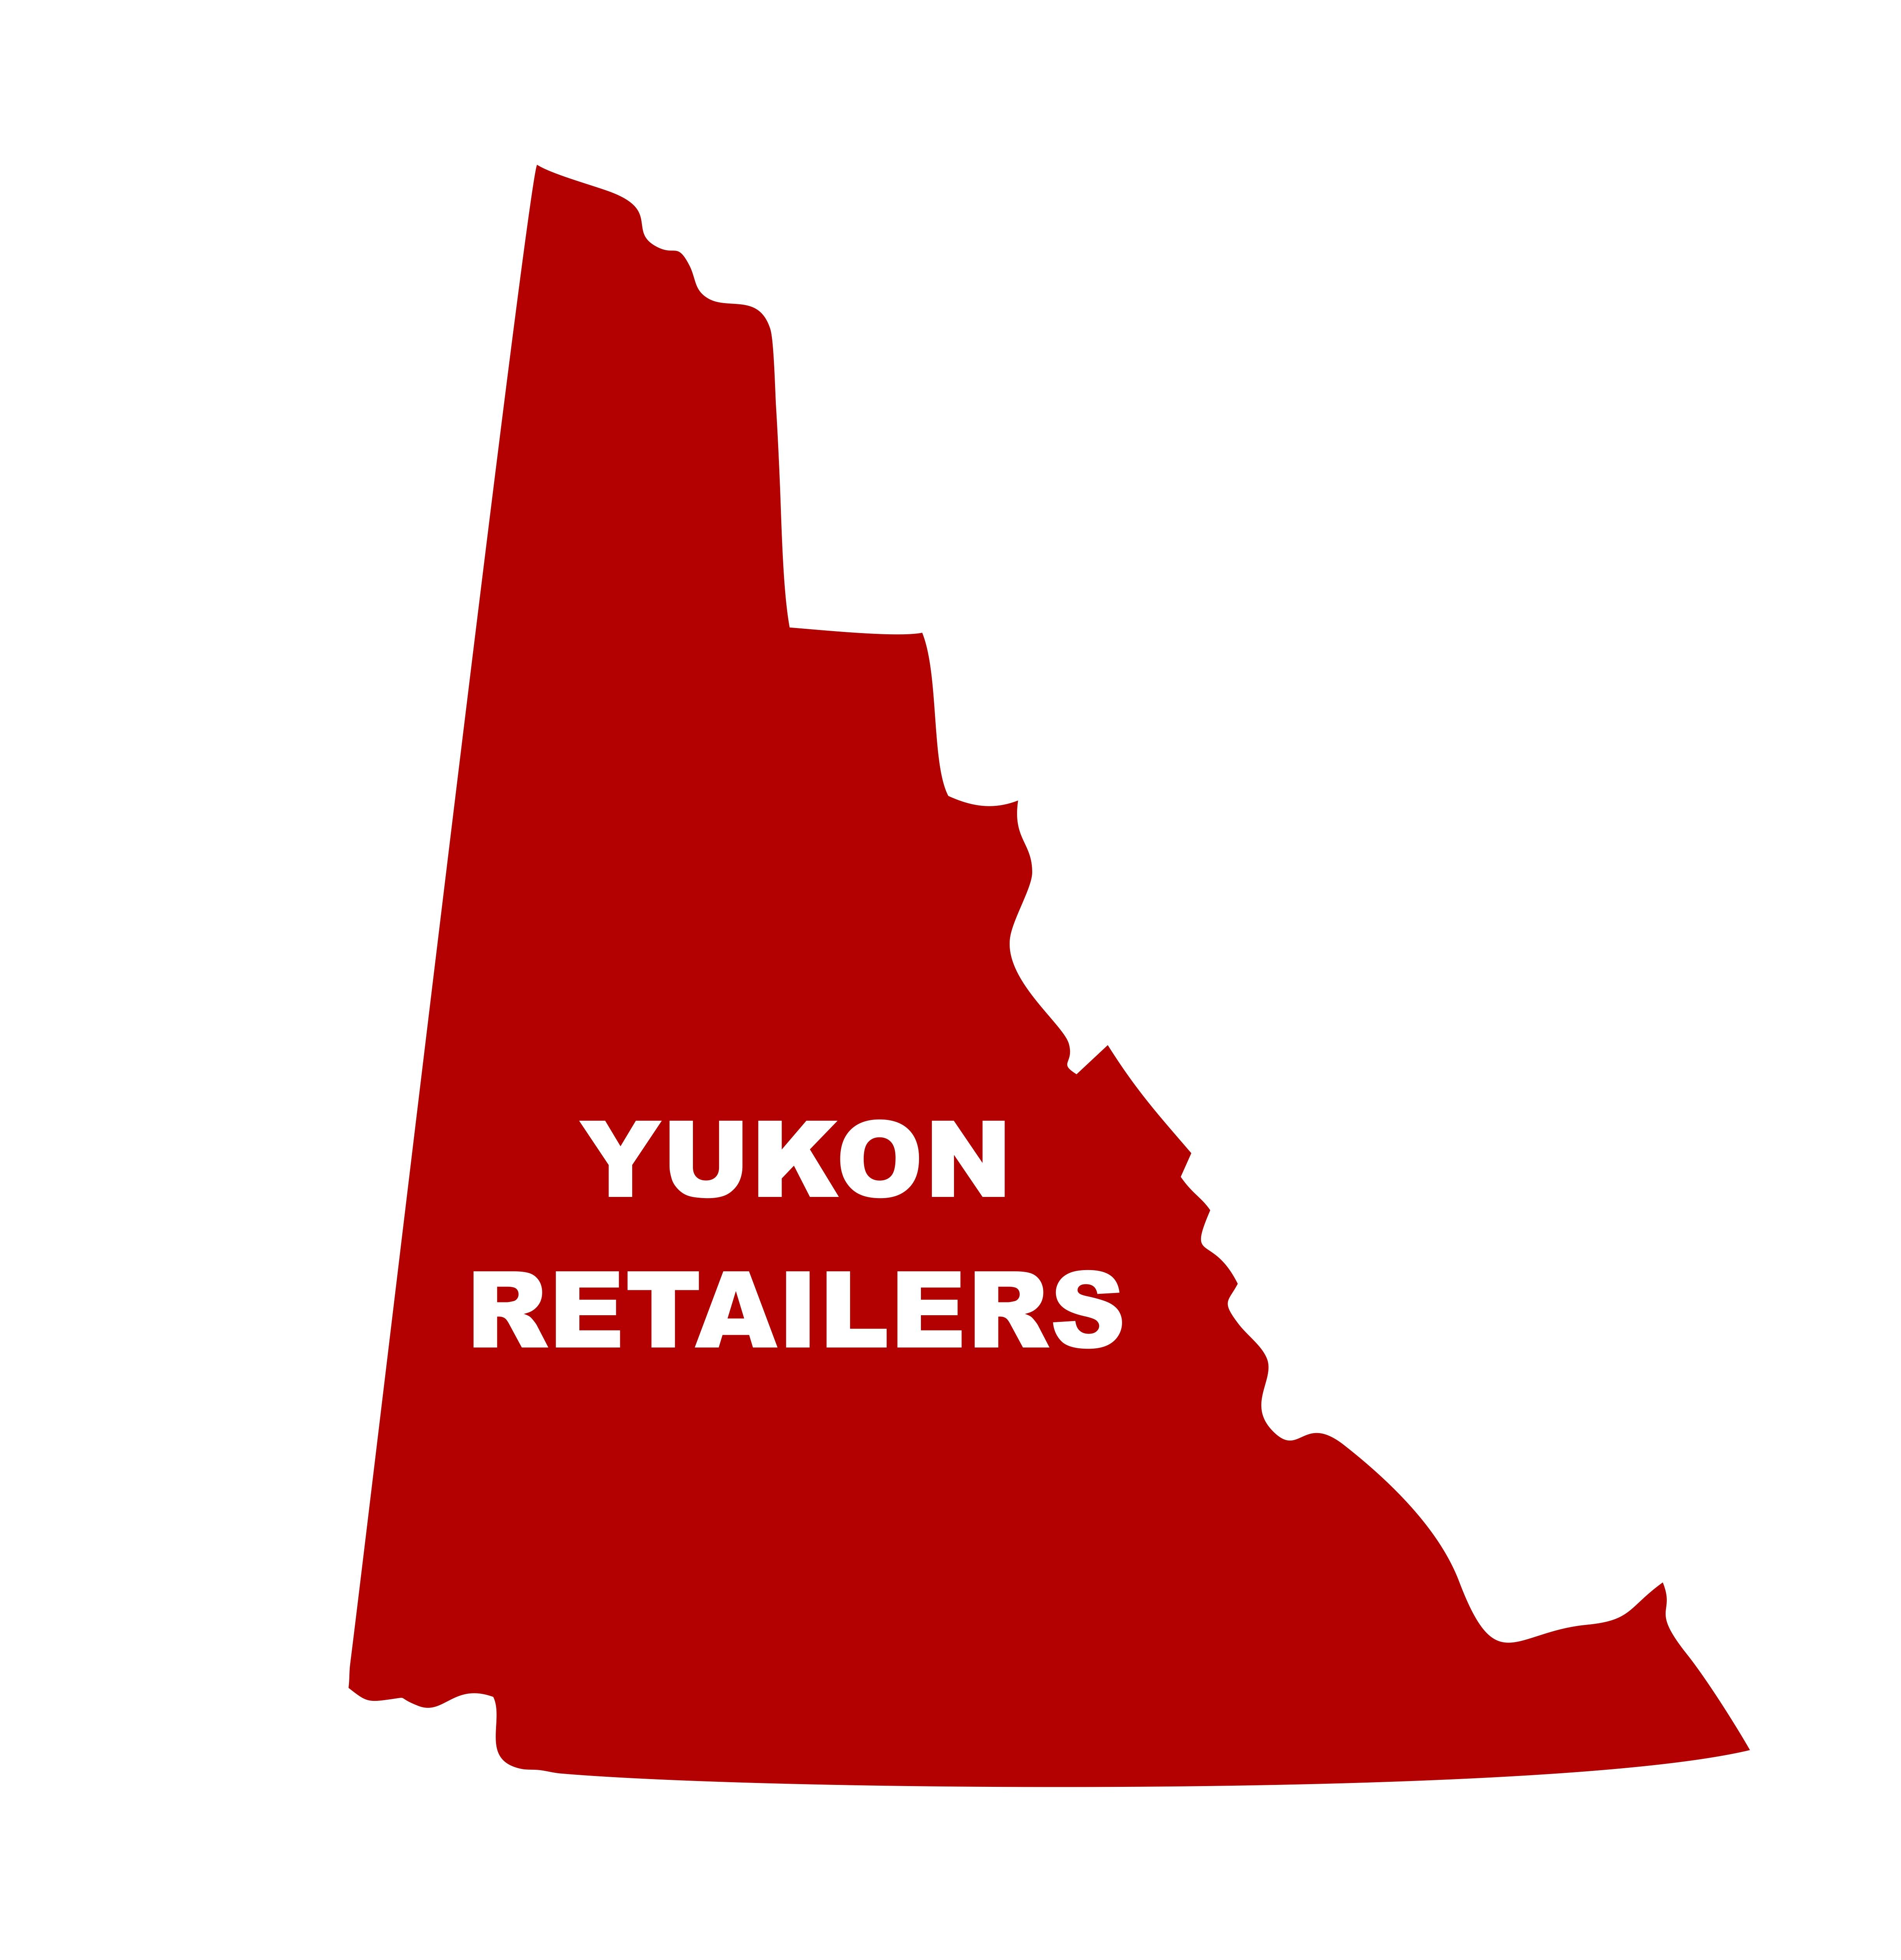 yukon-retailers.jpg